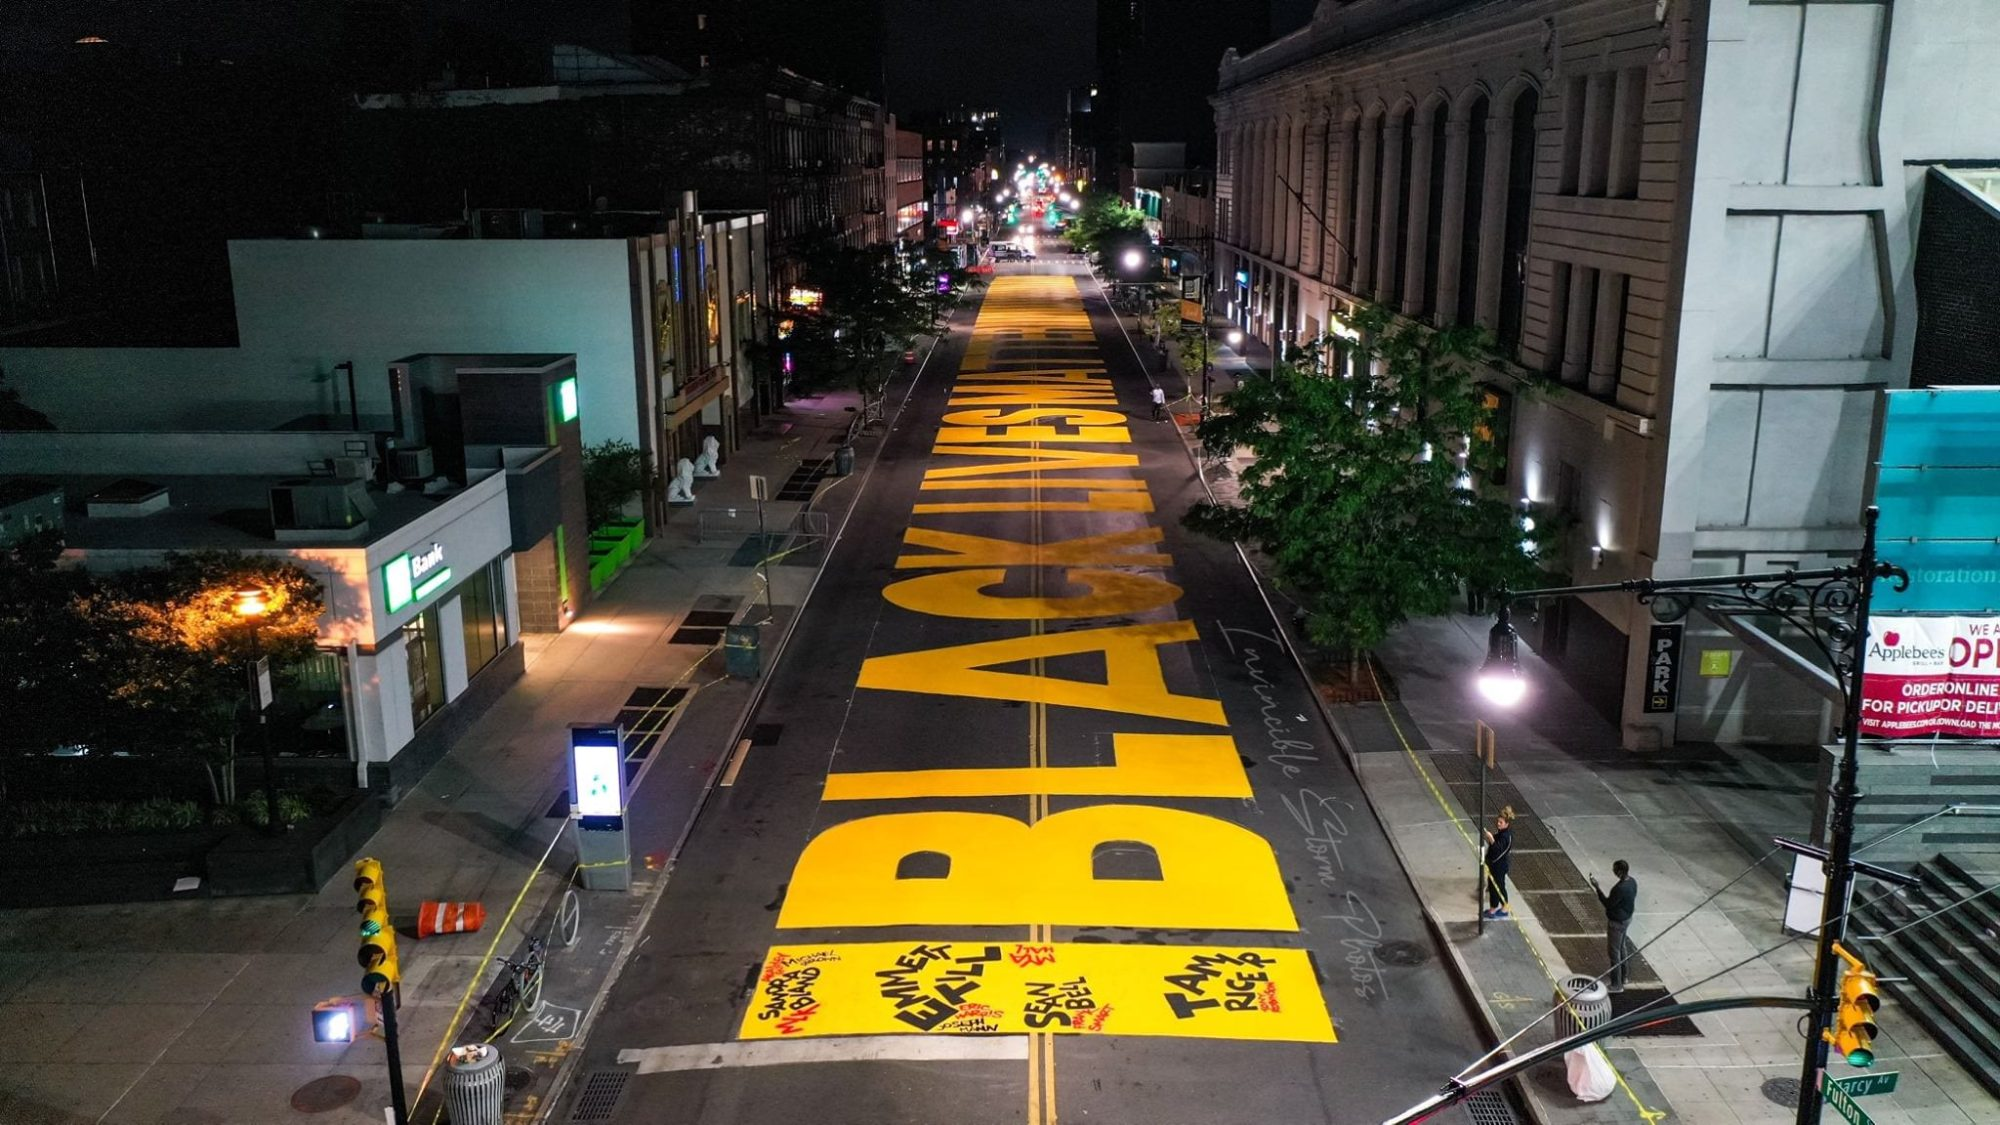 Drone captures 'Black Lives Matter' street art in Brooklyn, New York